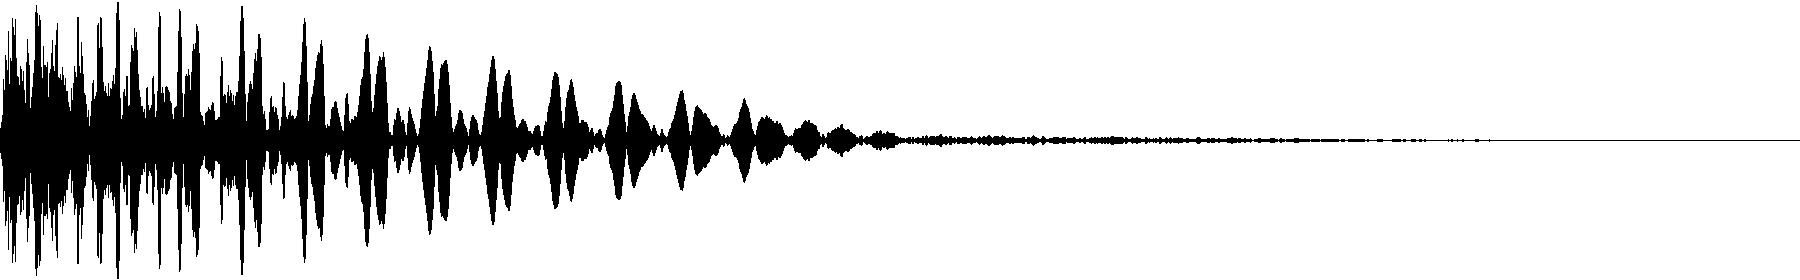 vedh synth cut 241 c